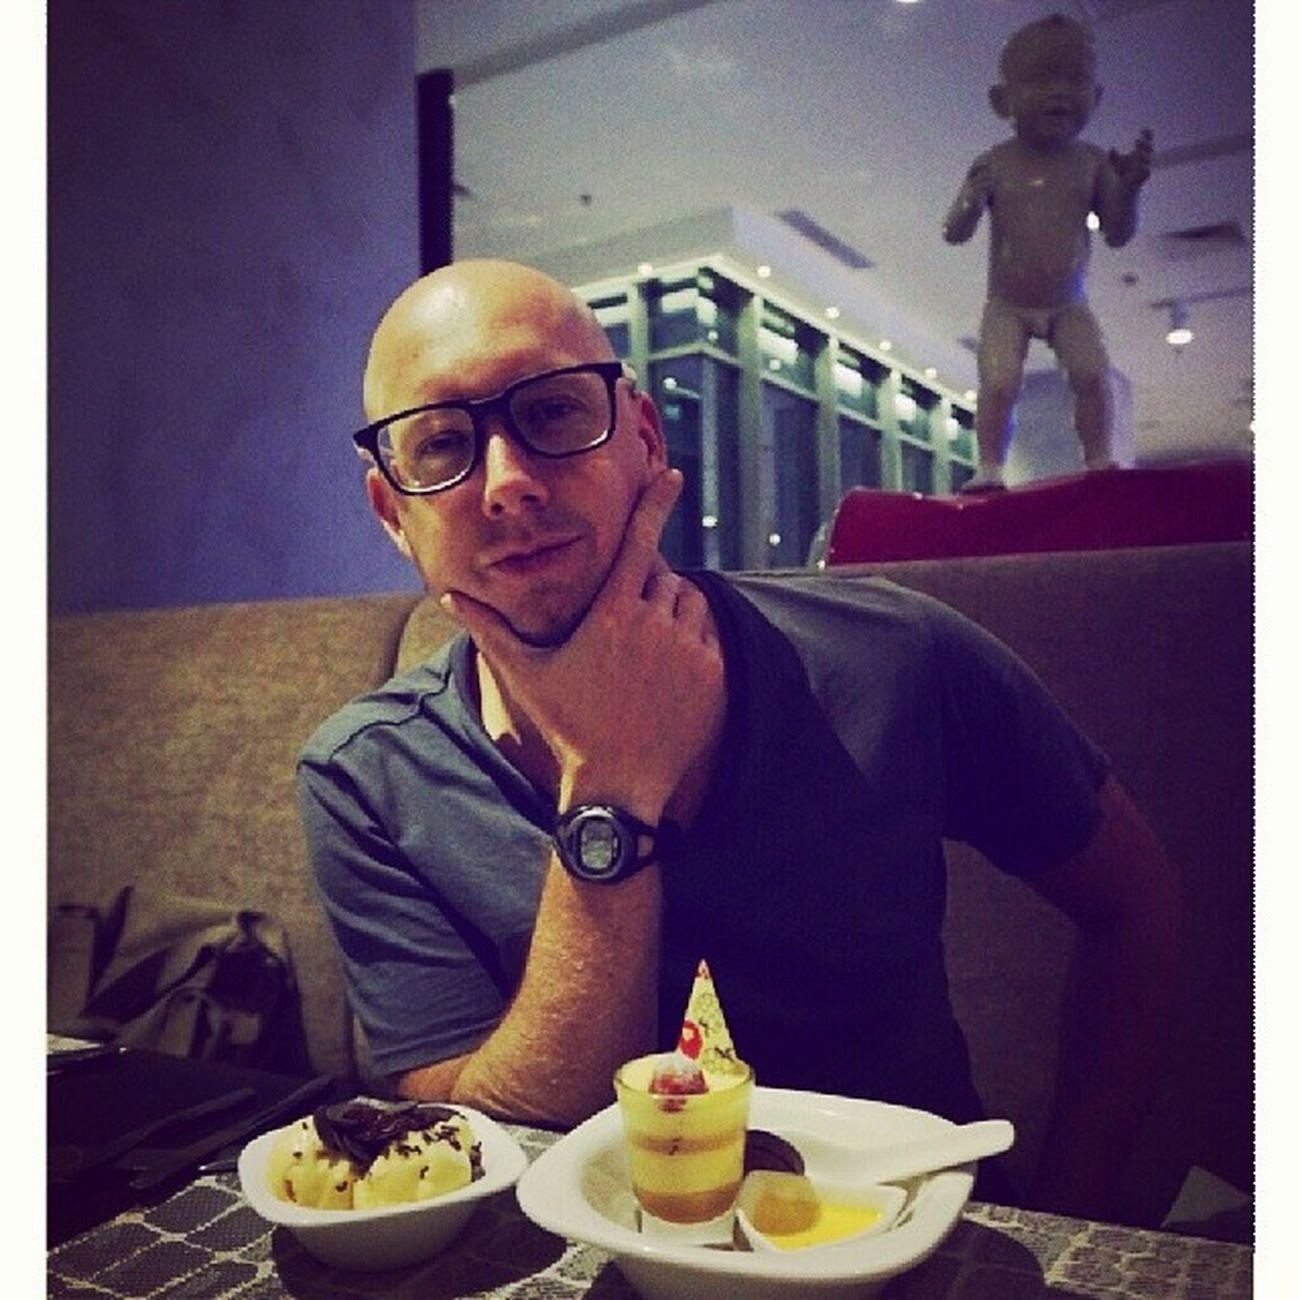 The dessert king